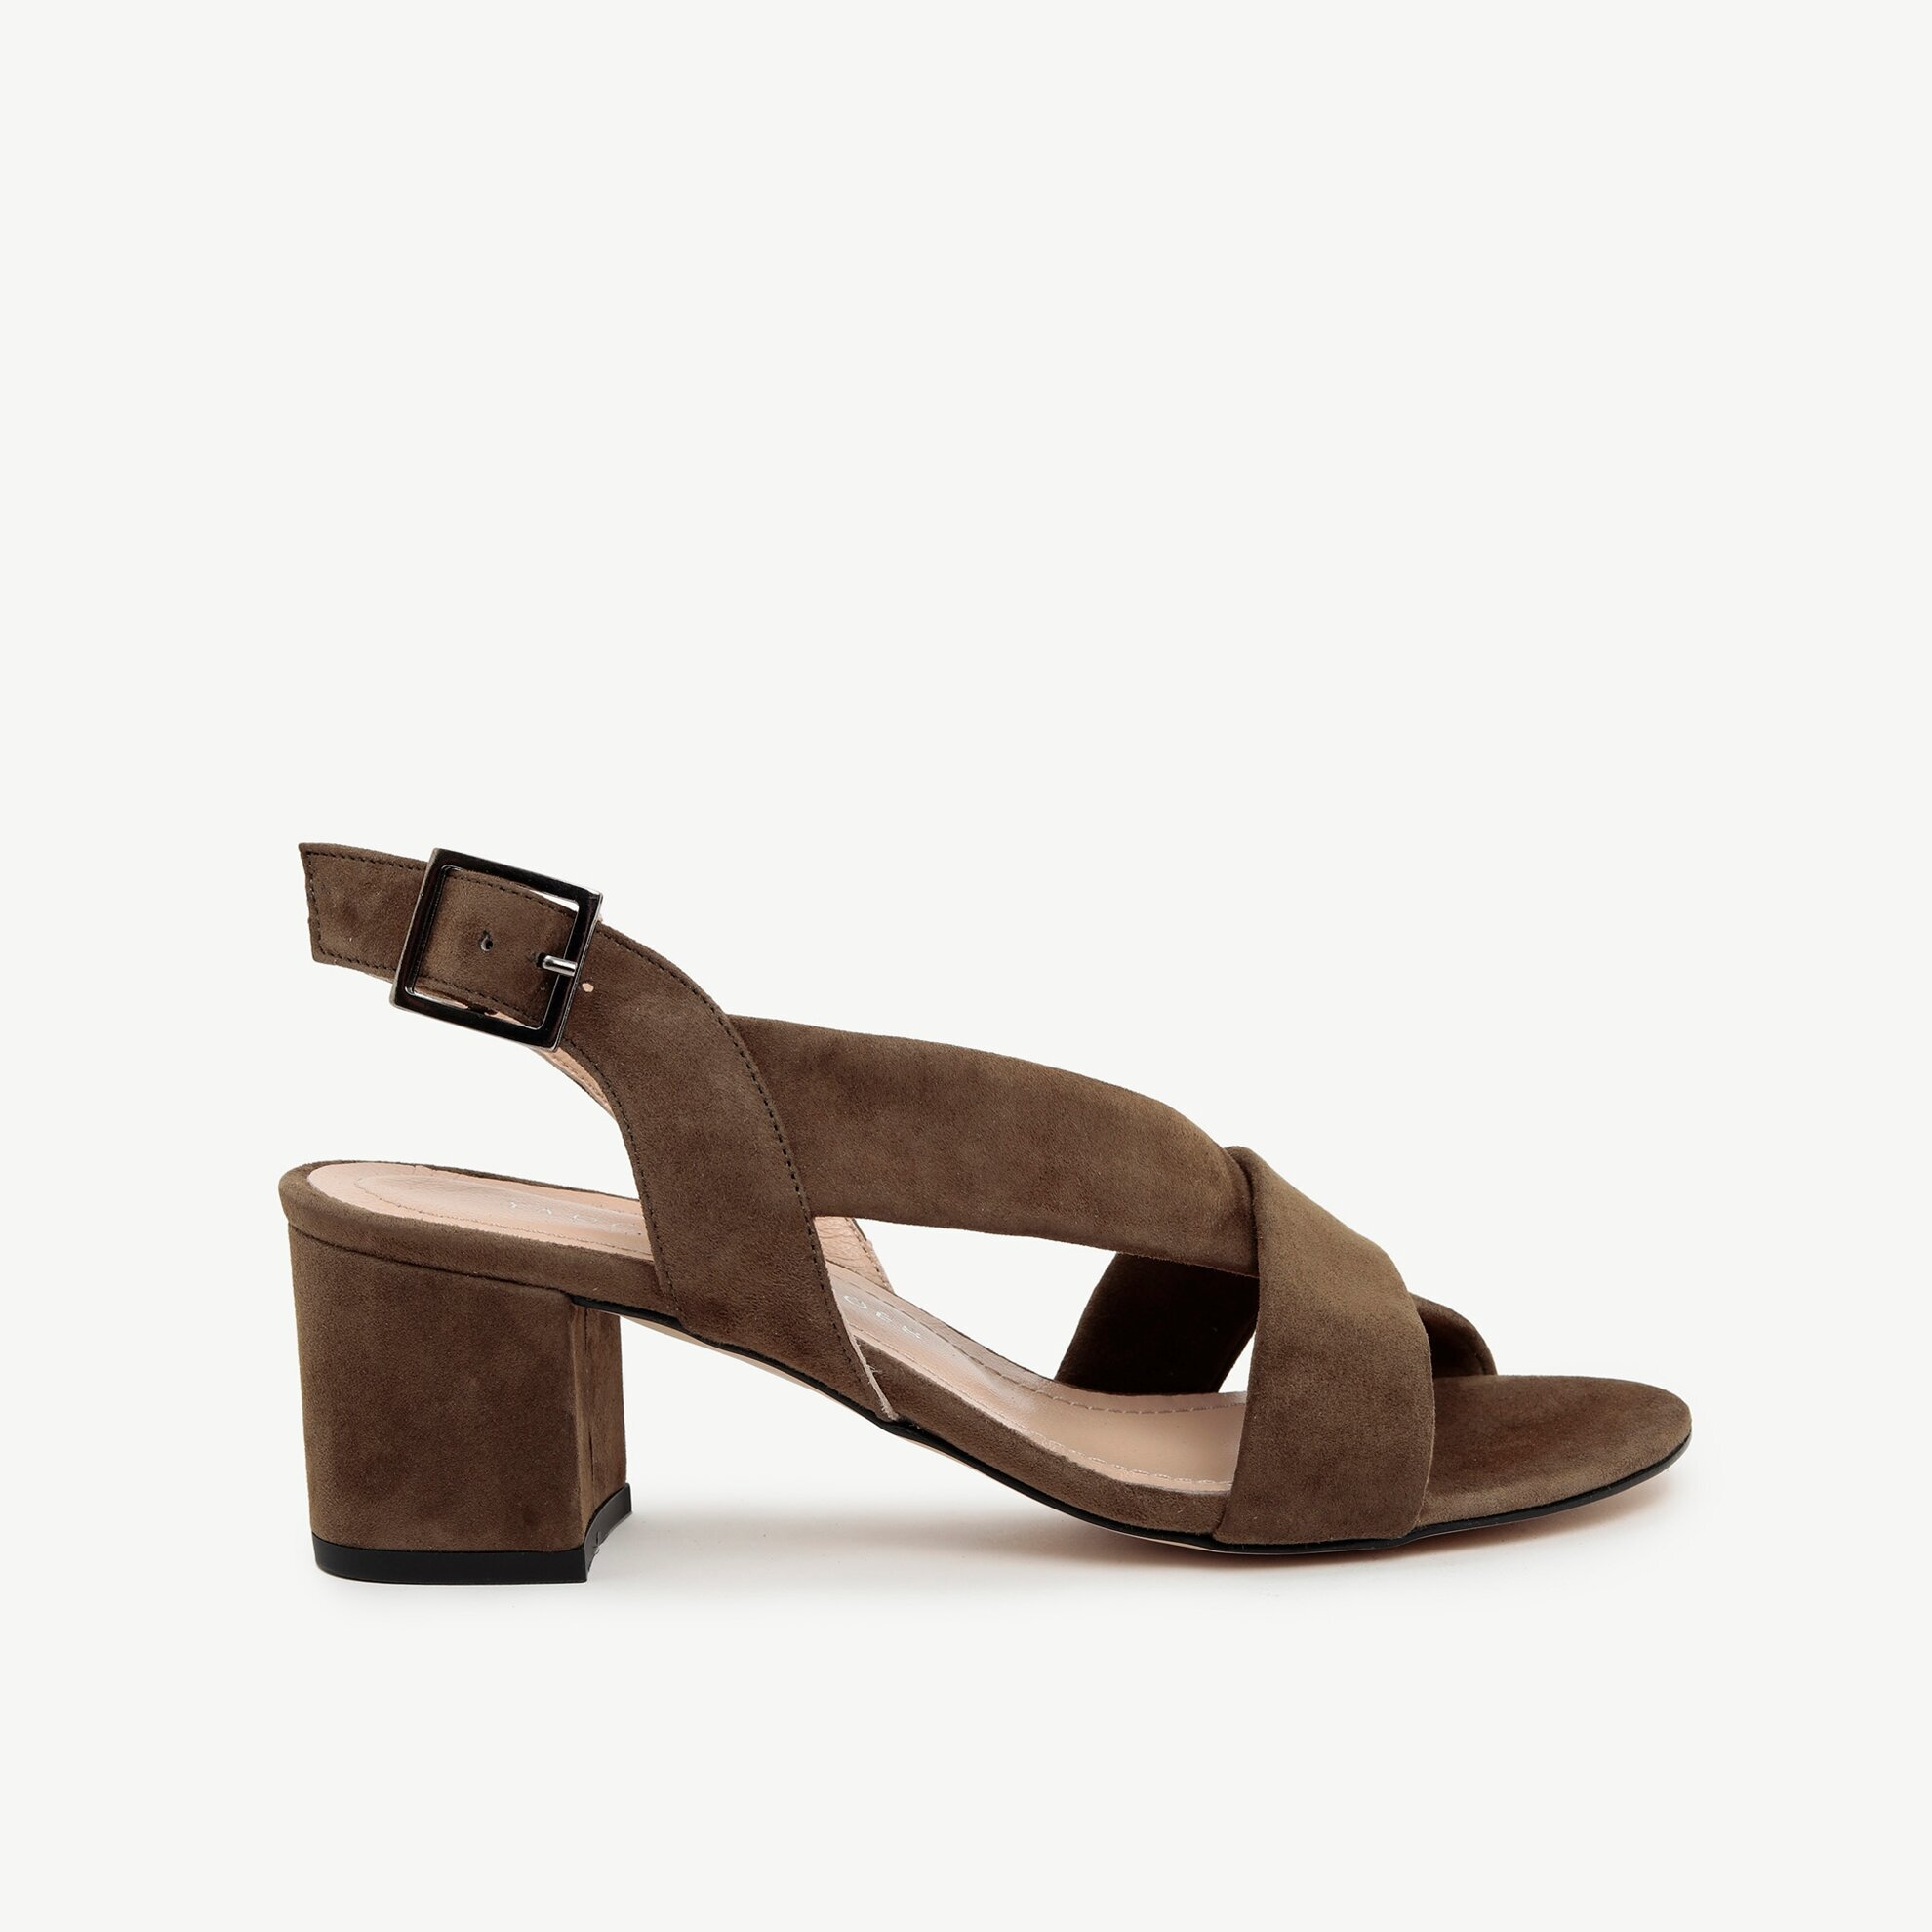 Çapraz Bantlı Süet Deri Topuklu Sandalet